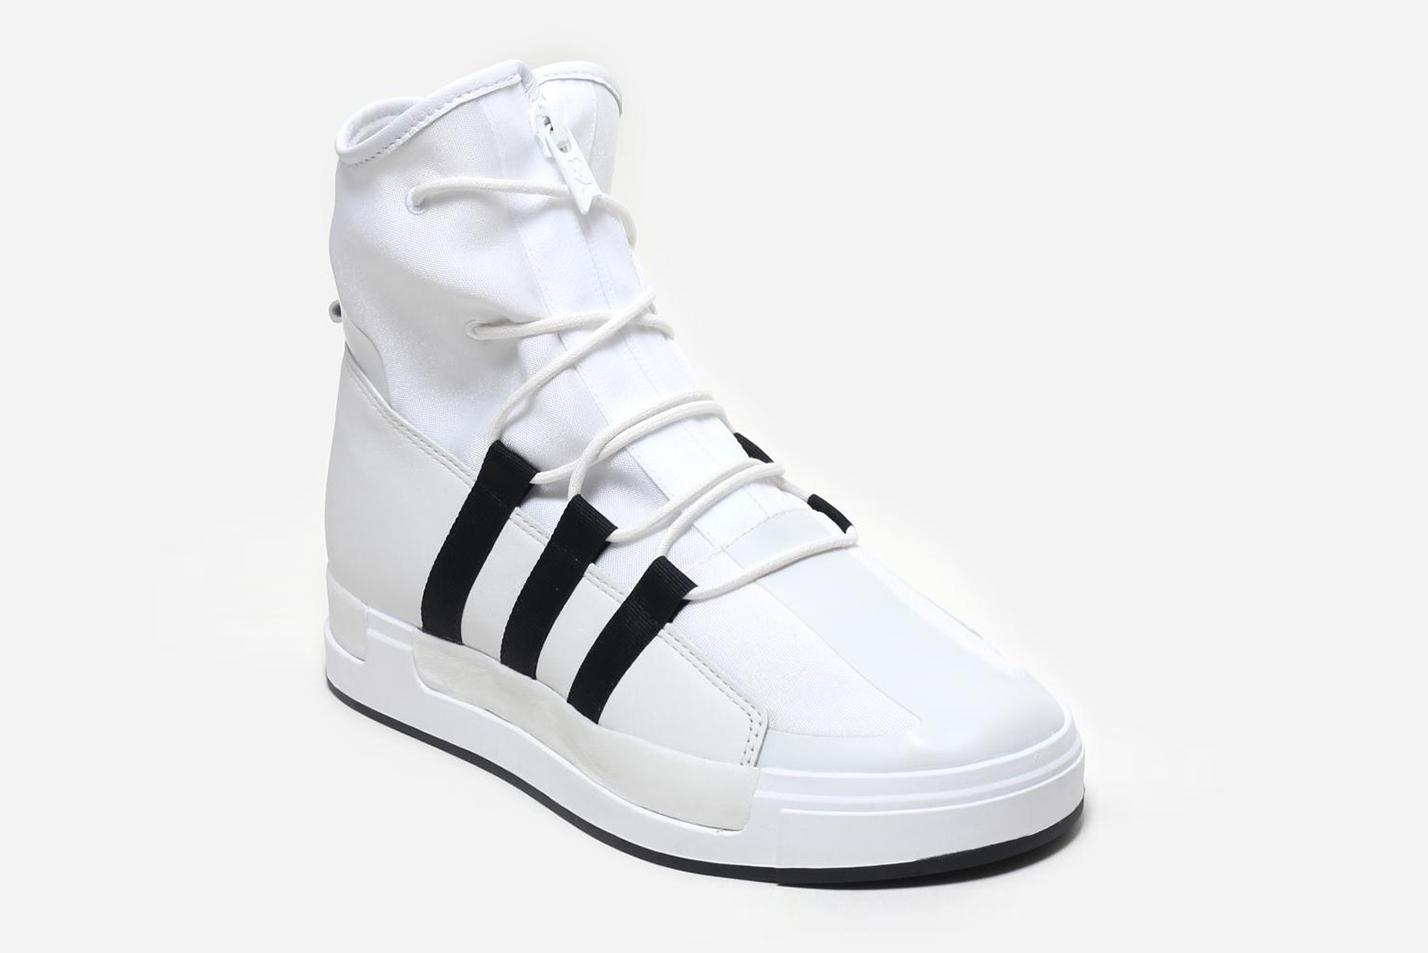 adidas Y-3 Yohji Yamamoto ATTA Sneaker